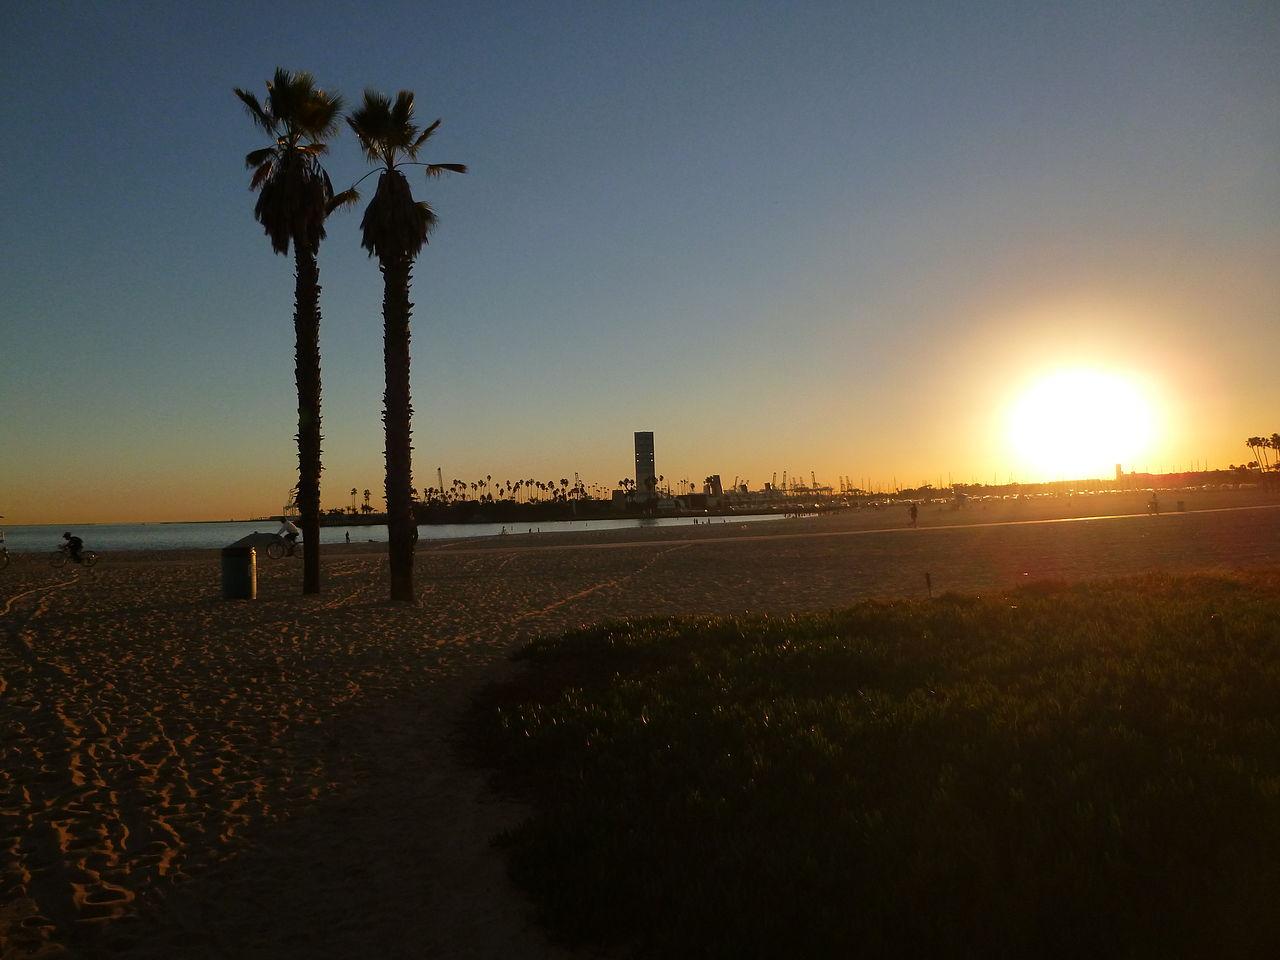 Long Beach, California Pacific Coast Highway